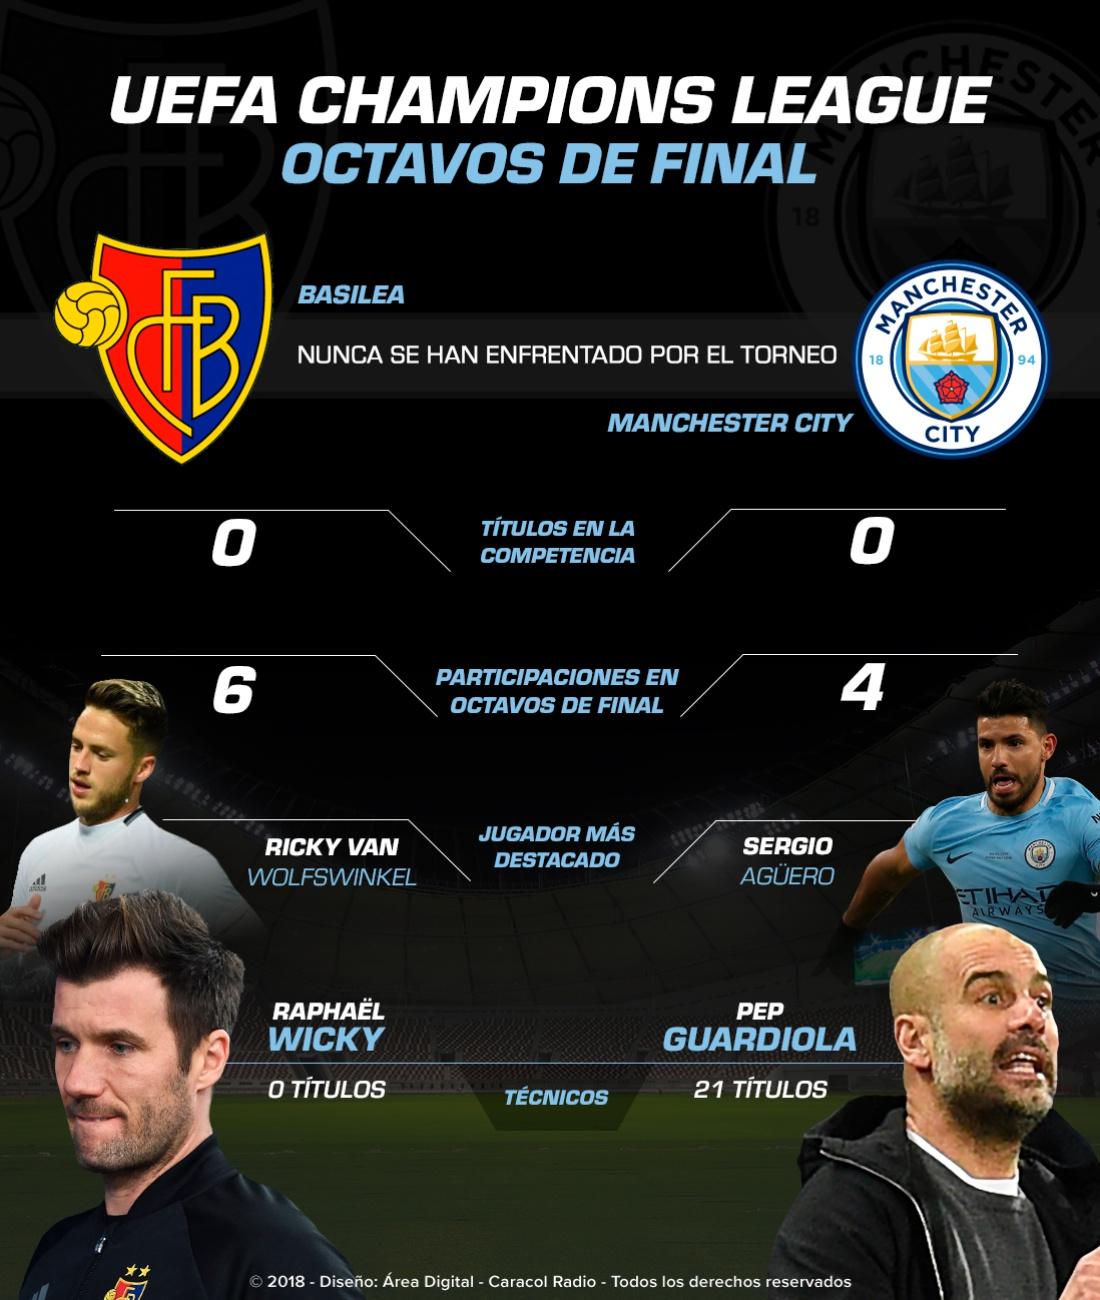 Basilea Vs. Manchester City: Basilea Vs. Manchester City, los de Guardiola asaltan Suiza